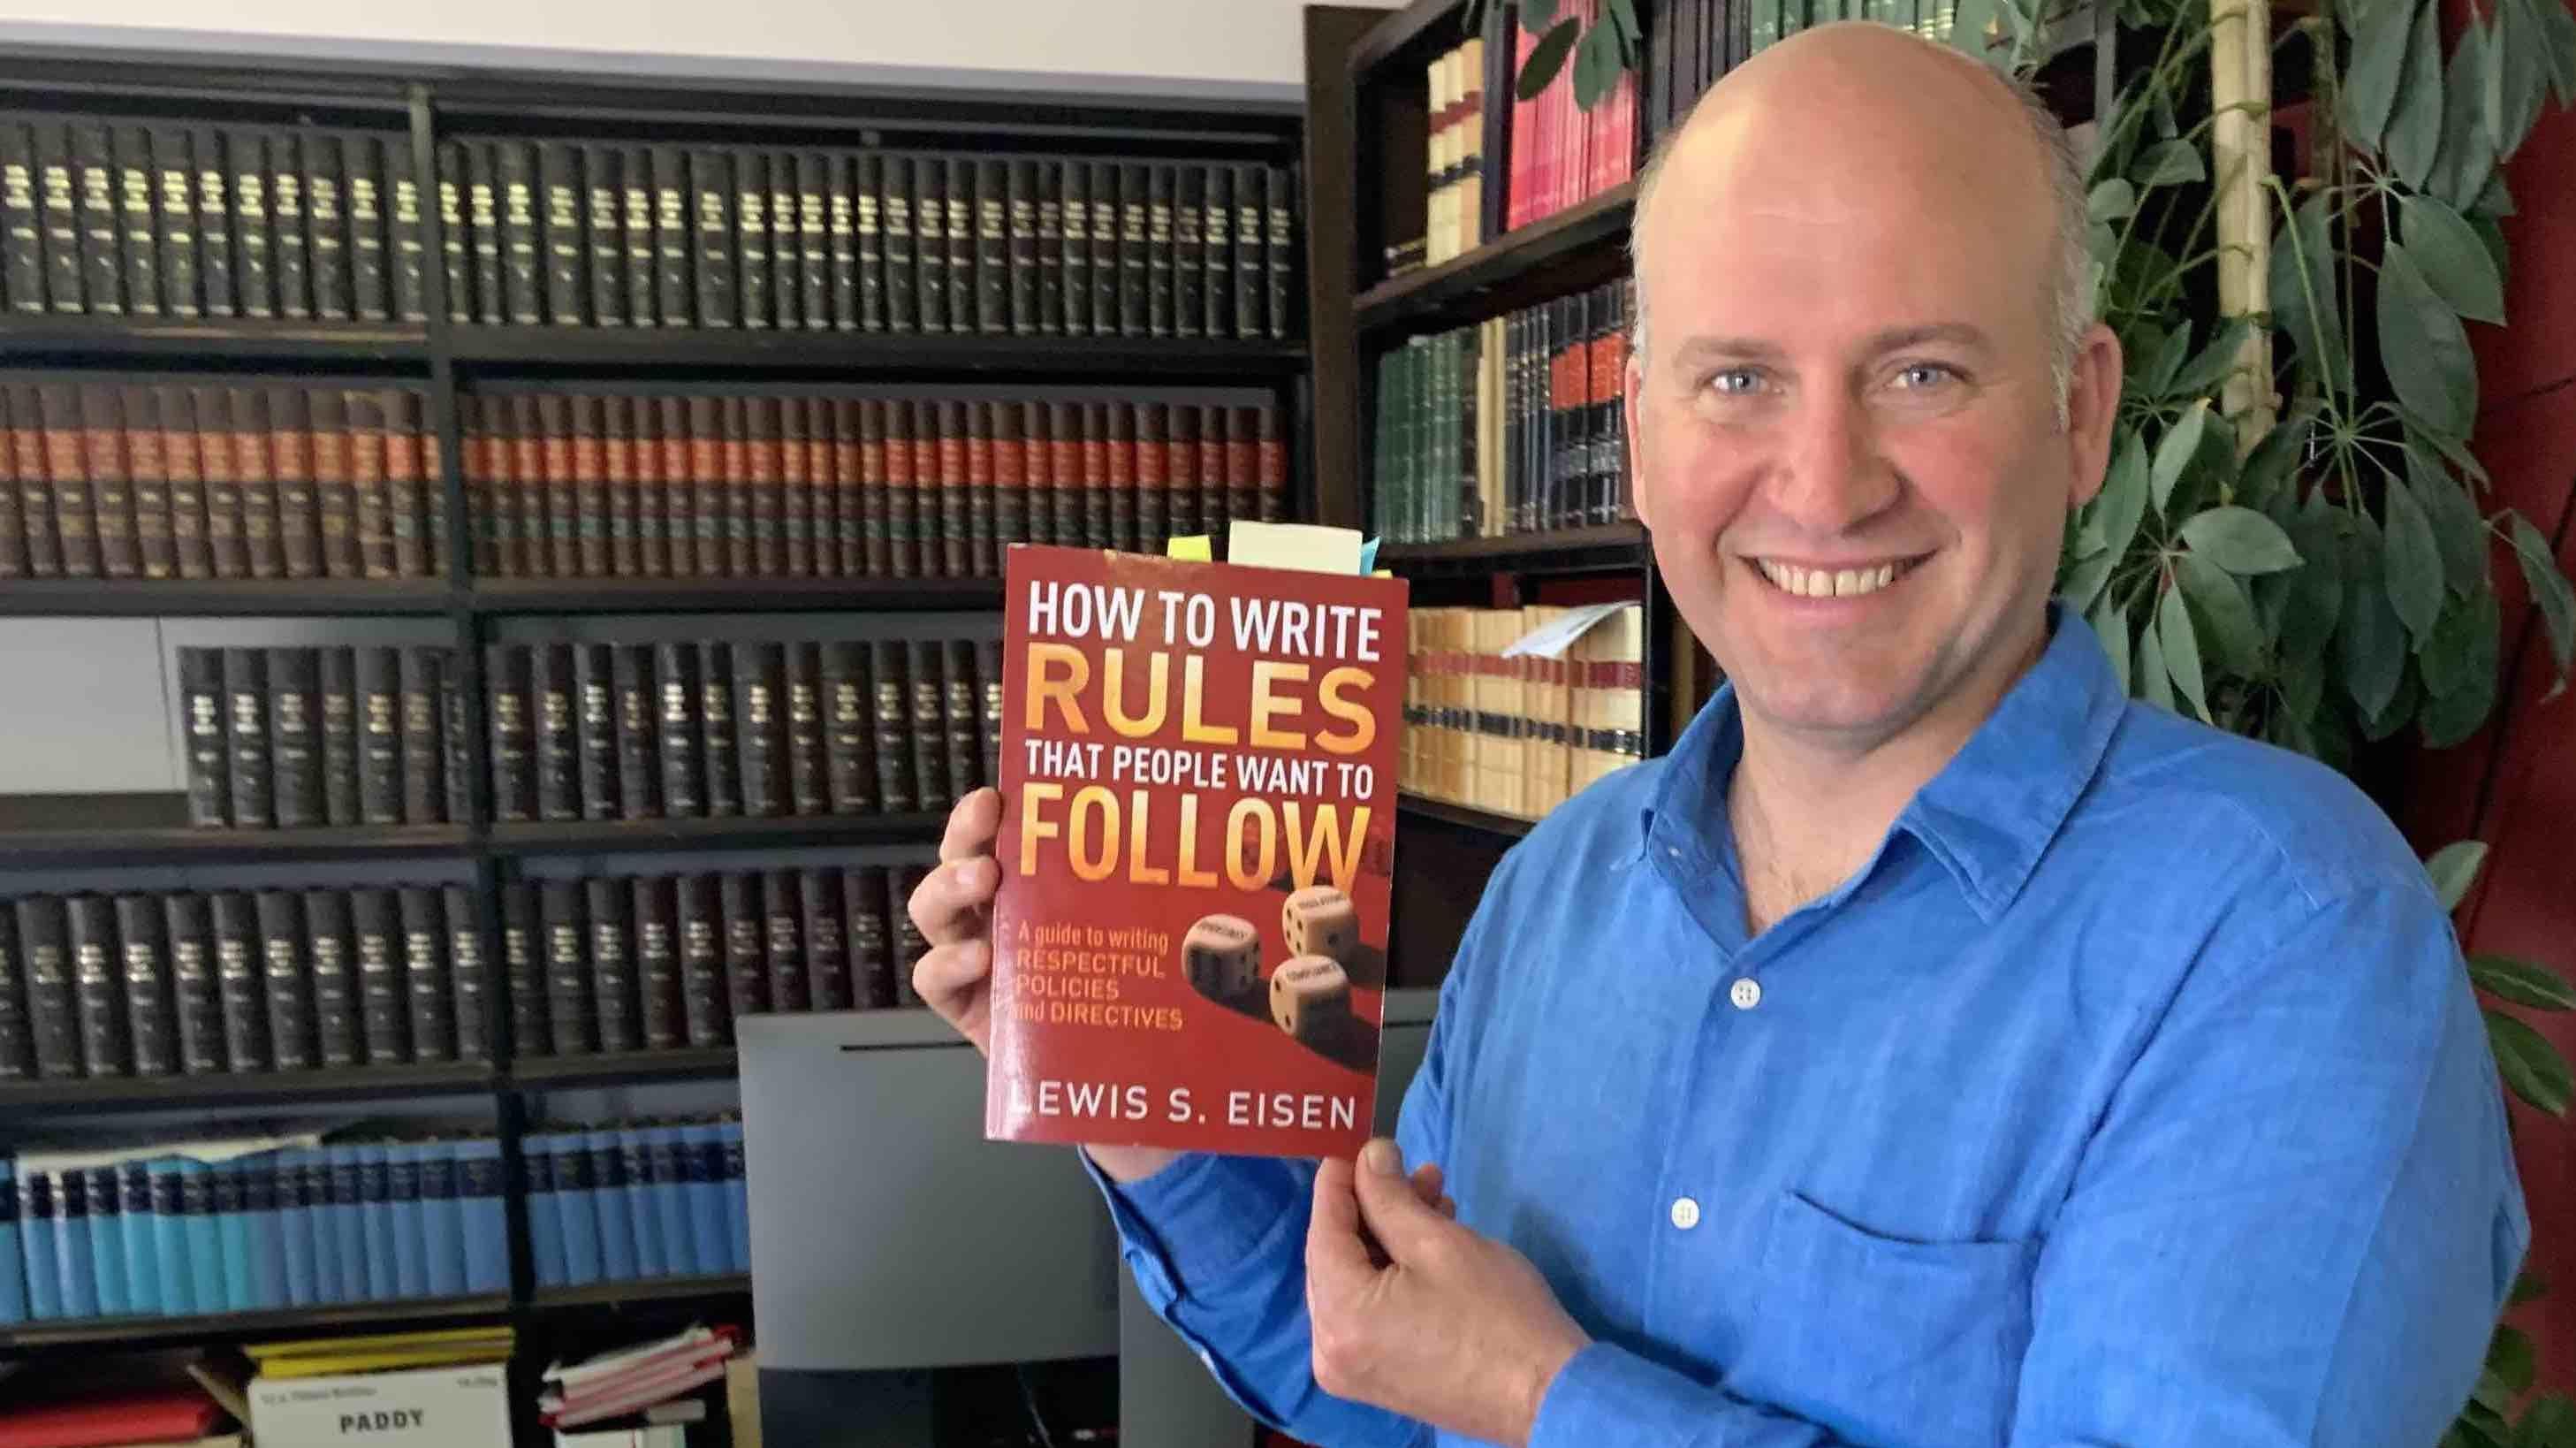 Respectful policies and directives book John